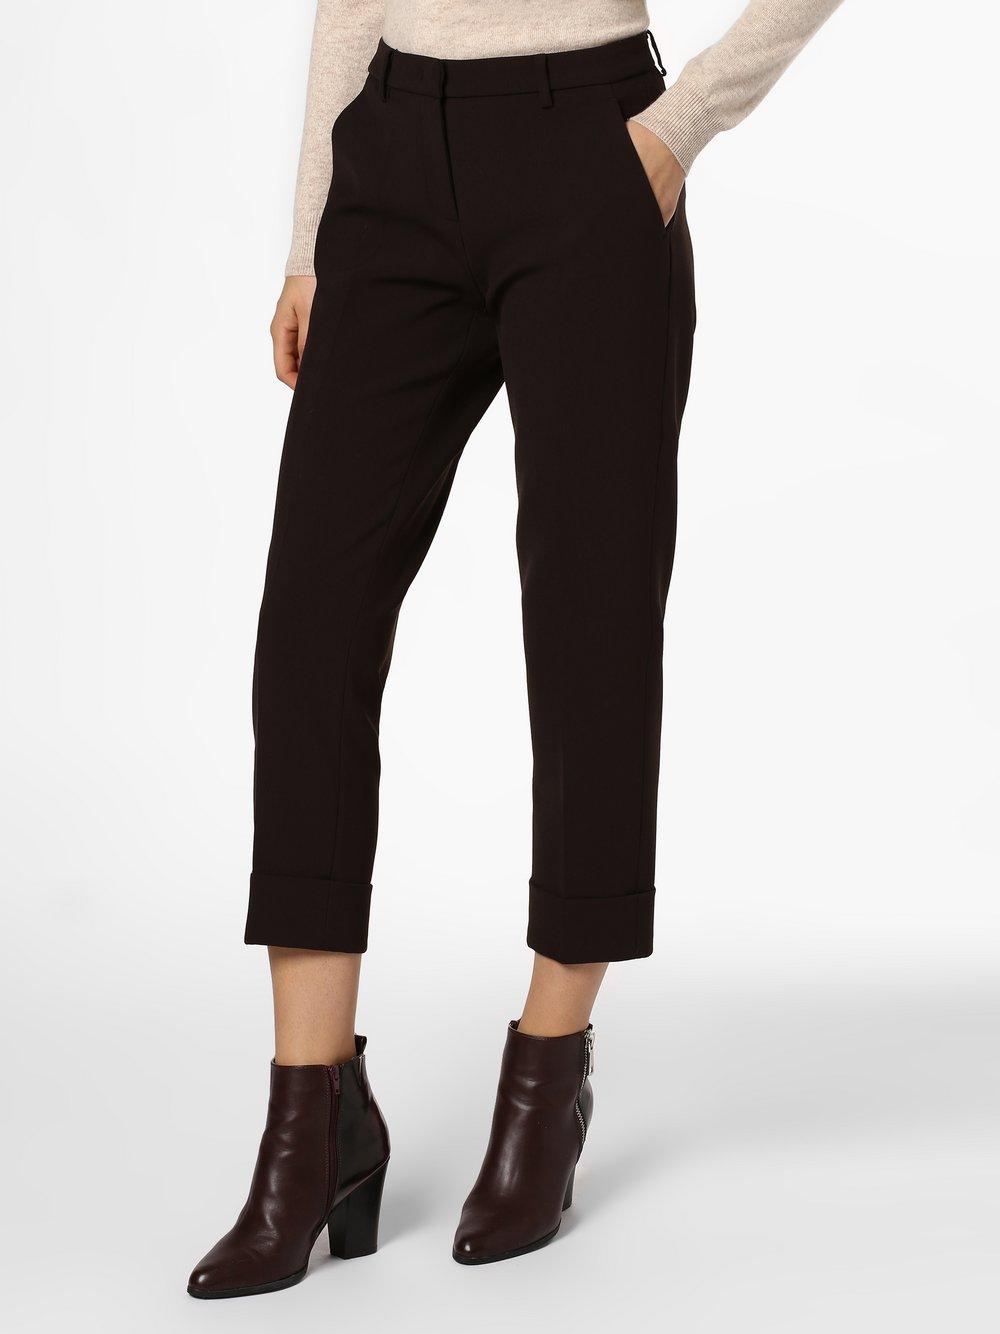 Cambio - Spodnie damskie – Krystal, brązowy